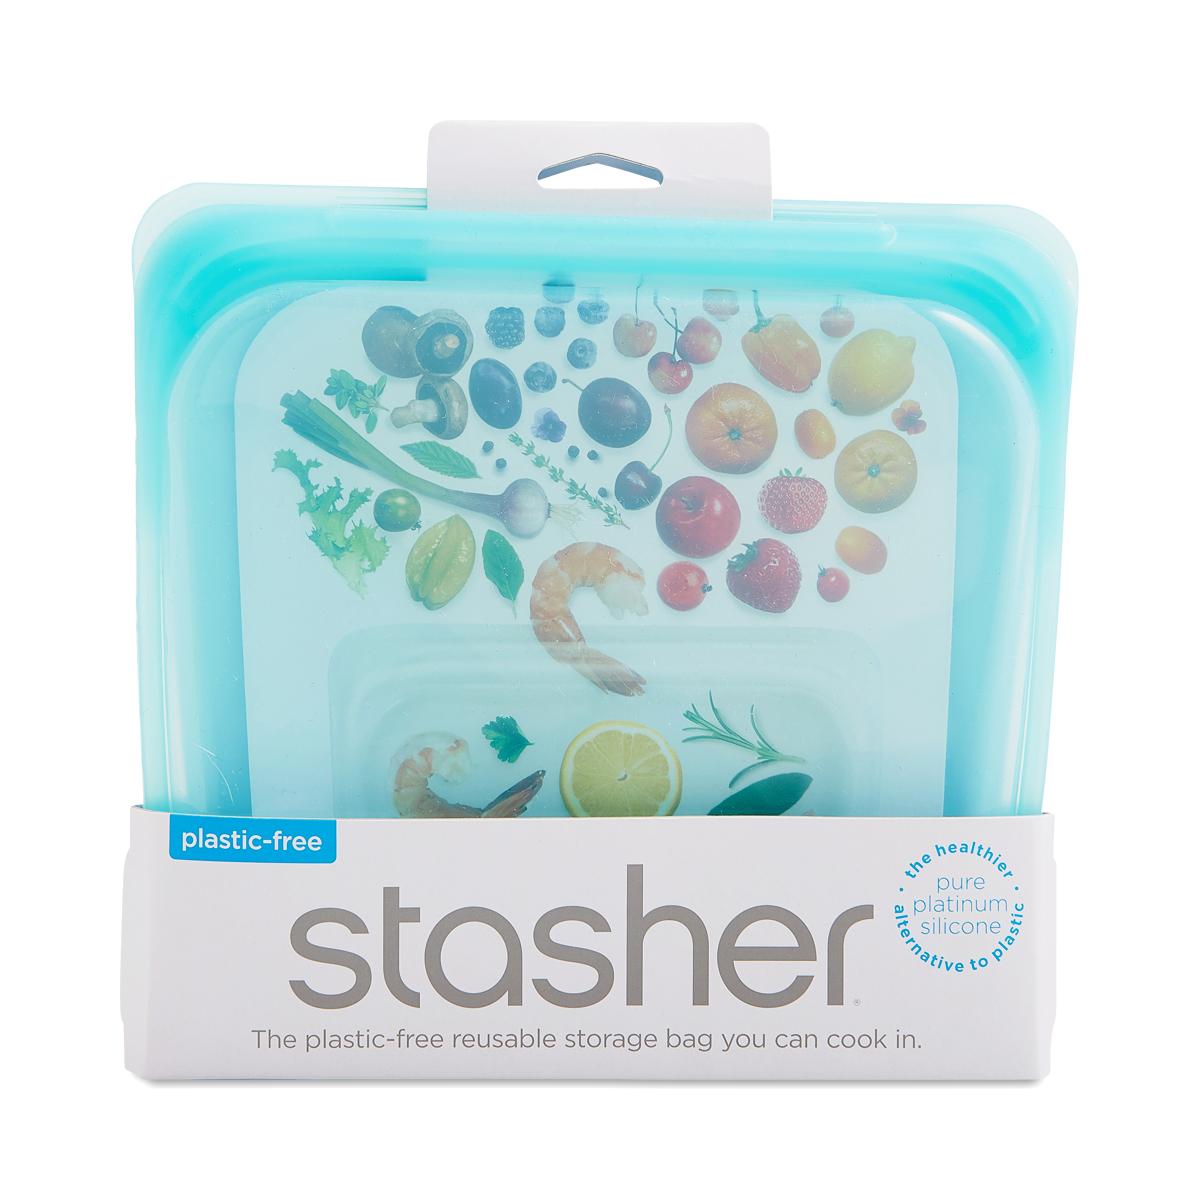 Stasher Reusable Silicone Bag, Aqua 1 count